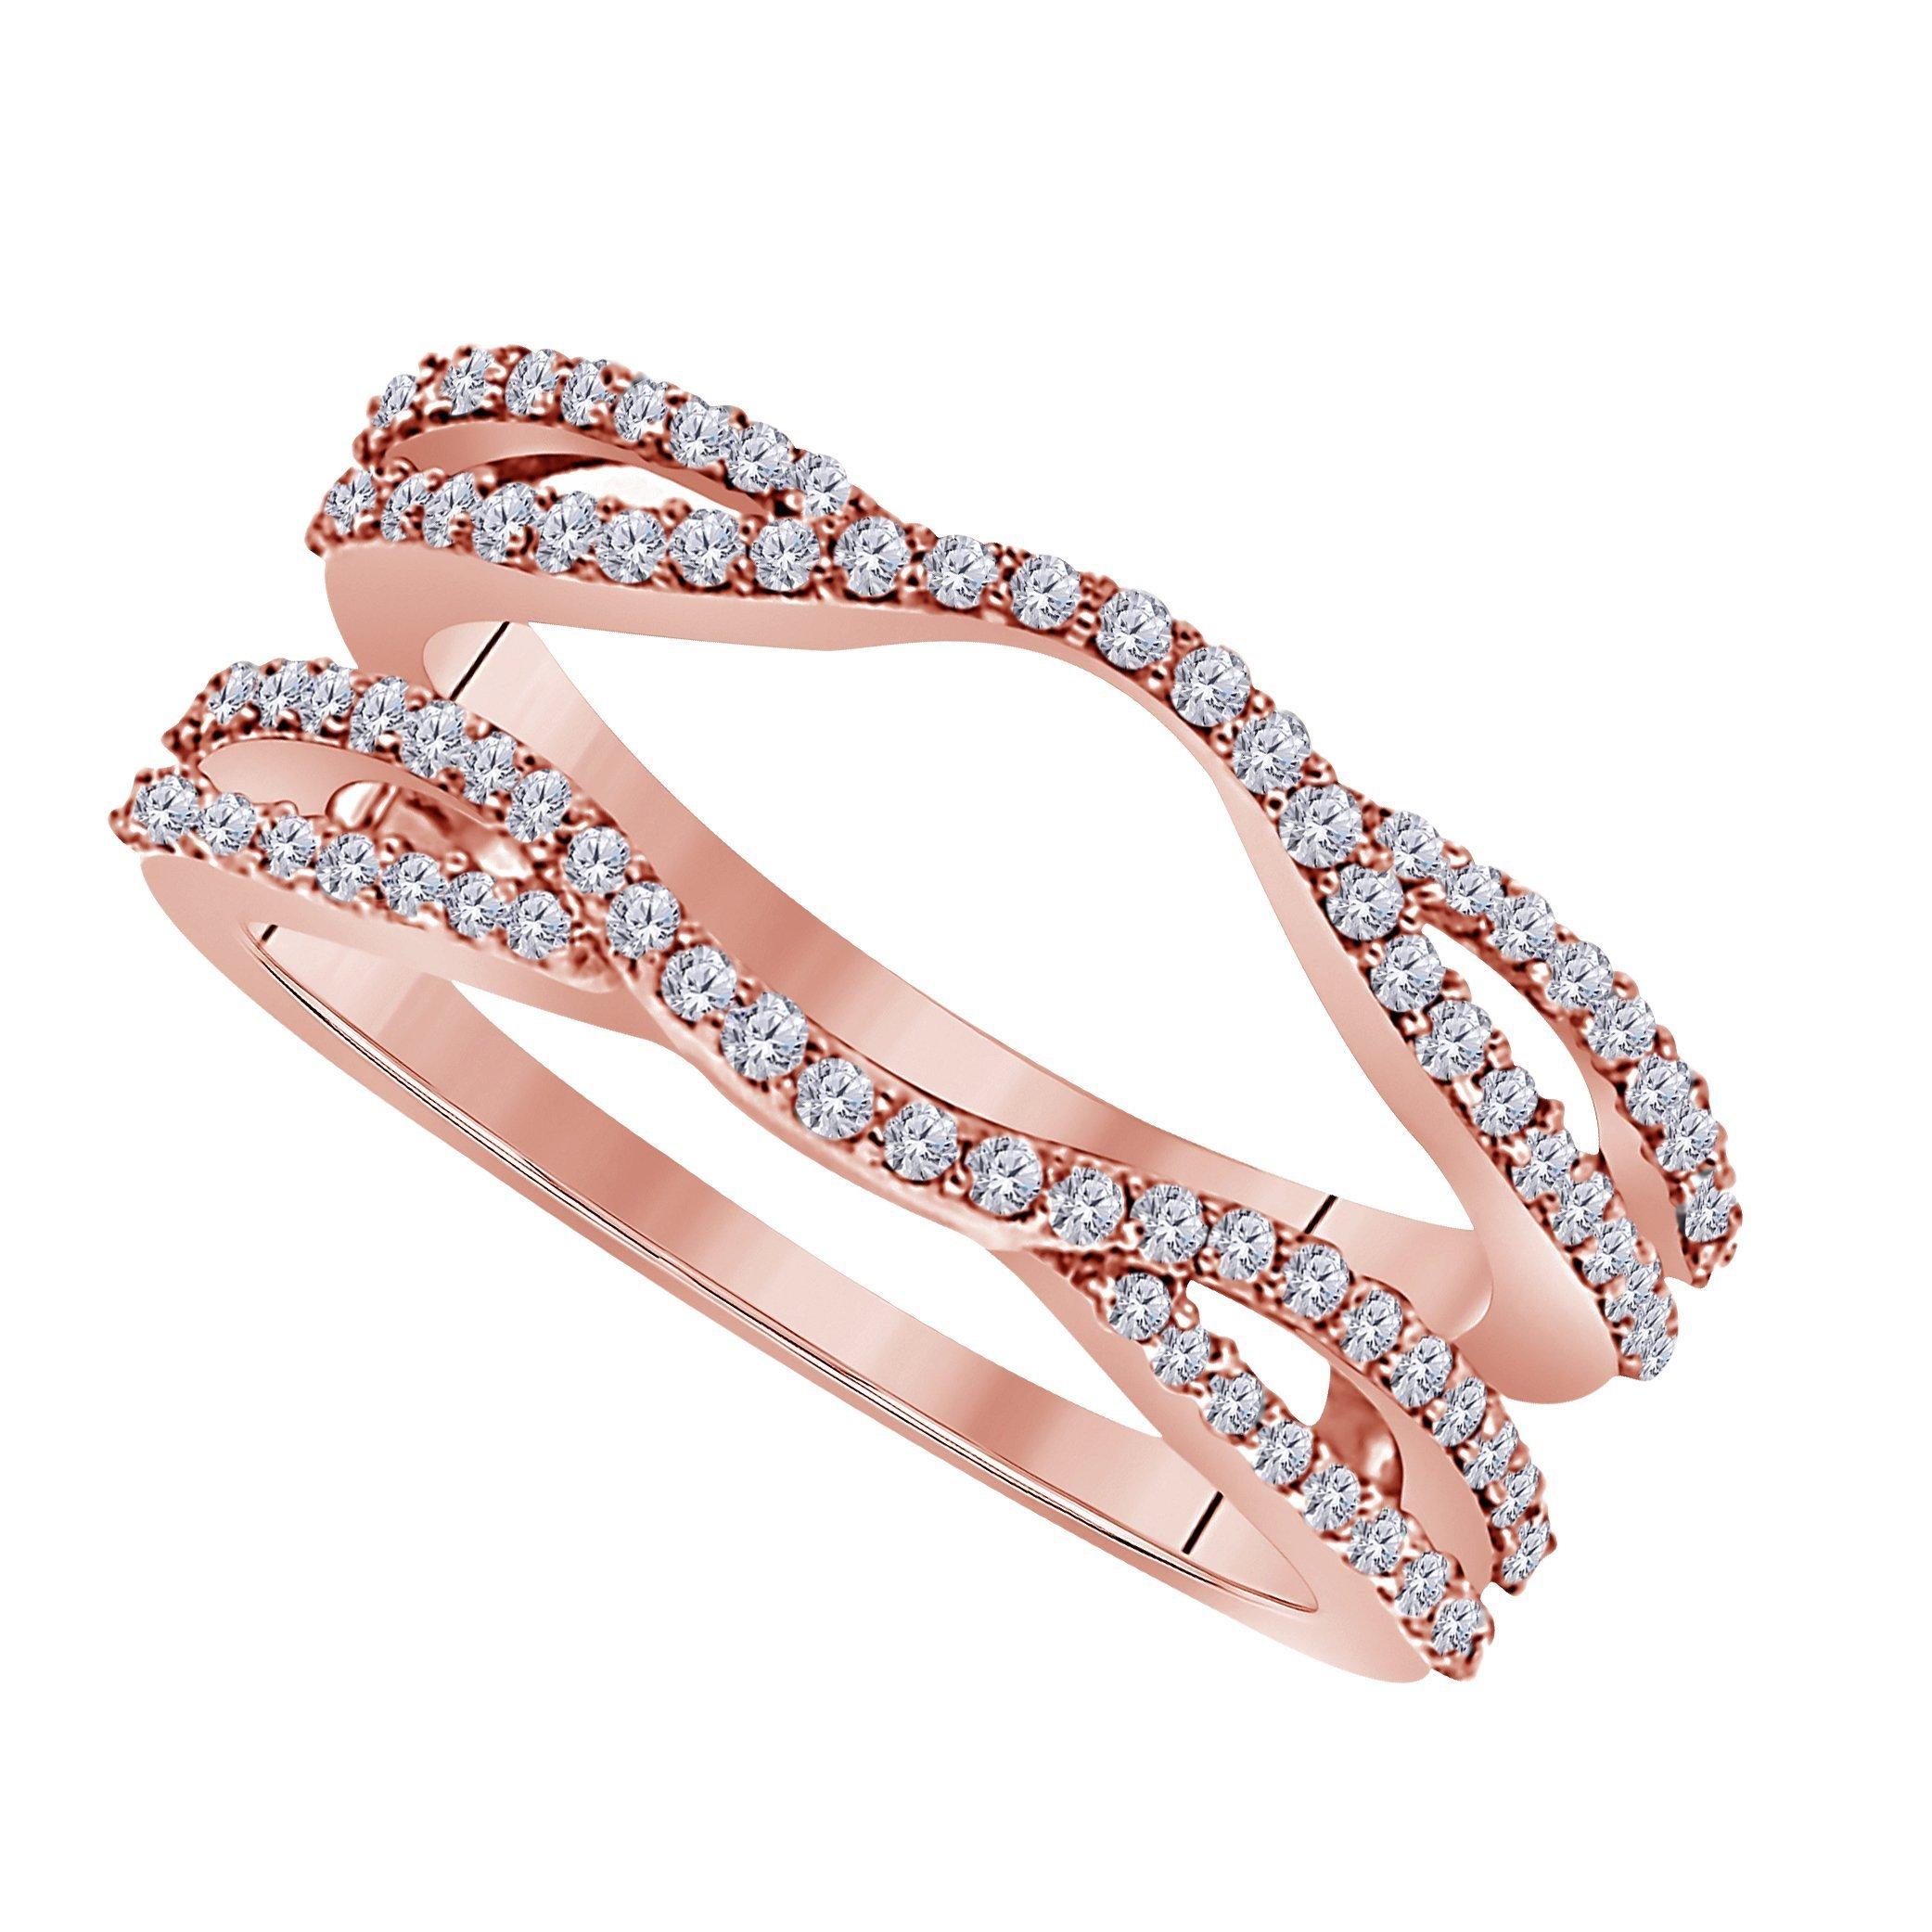 Star Retail 1/2 Ct 14K Rose Gold Finish Round Cut Cubic Zirconia Ladies Anniversary Wedding Band Enhancer Guard Double Chevron Ring